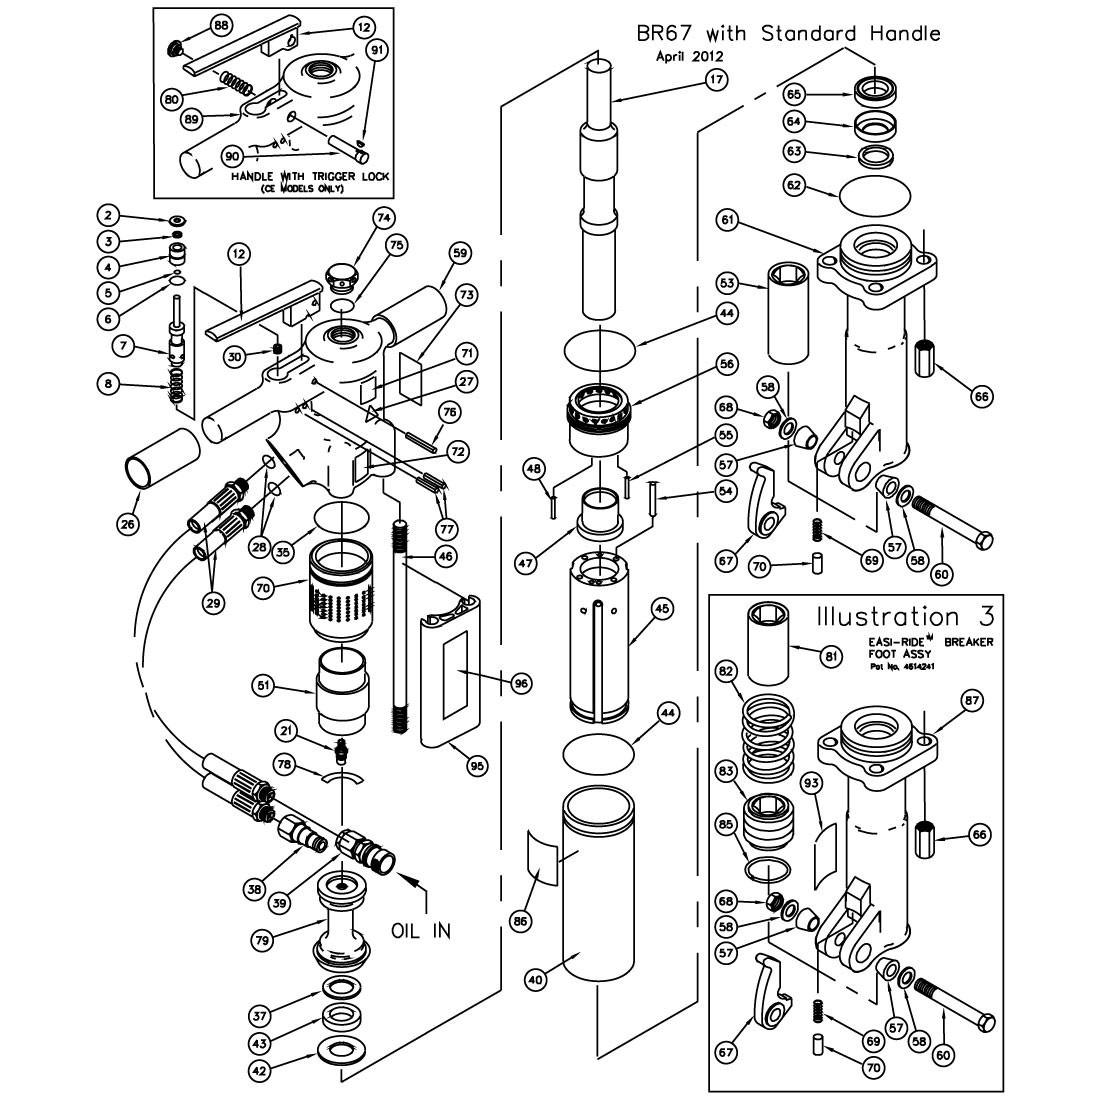 Stanley BR67 Handle Parts Illustration